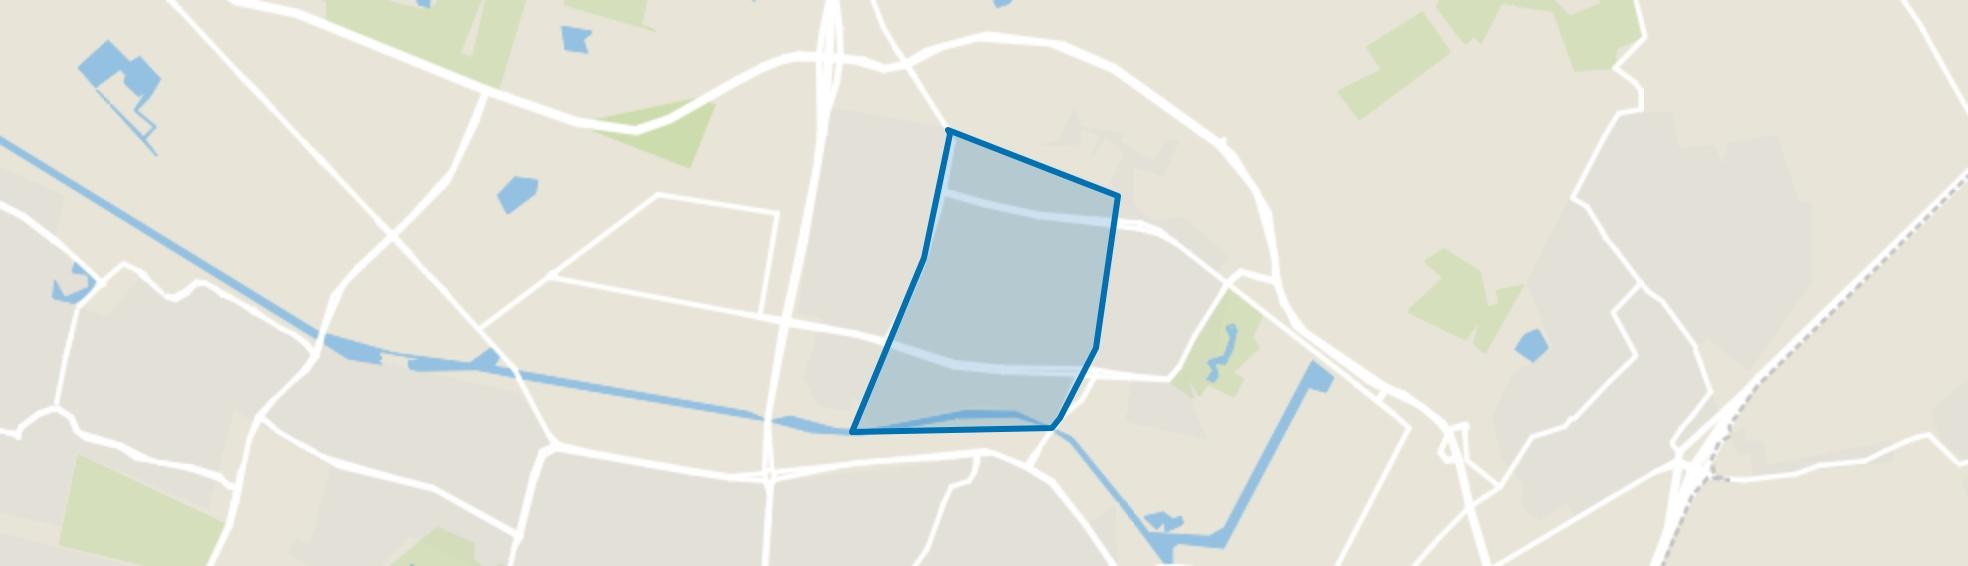 Heikant, Tilburg map